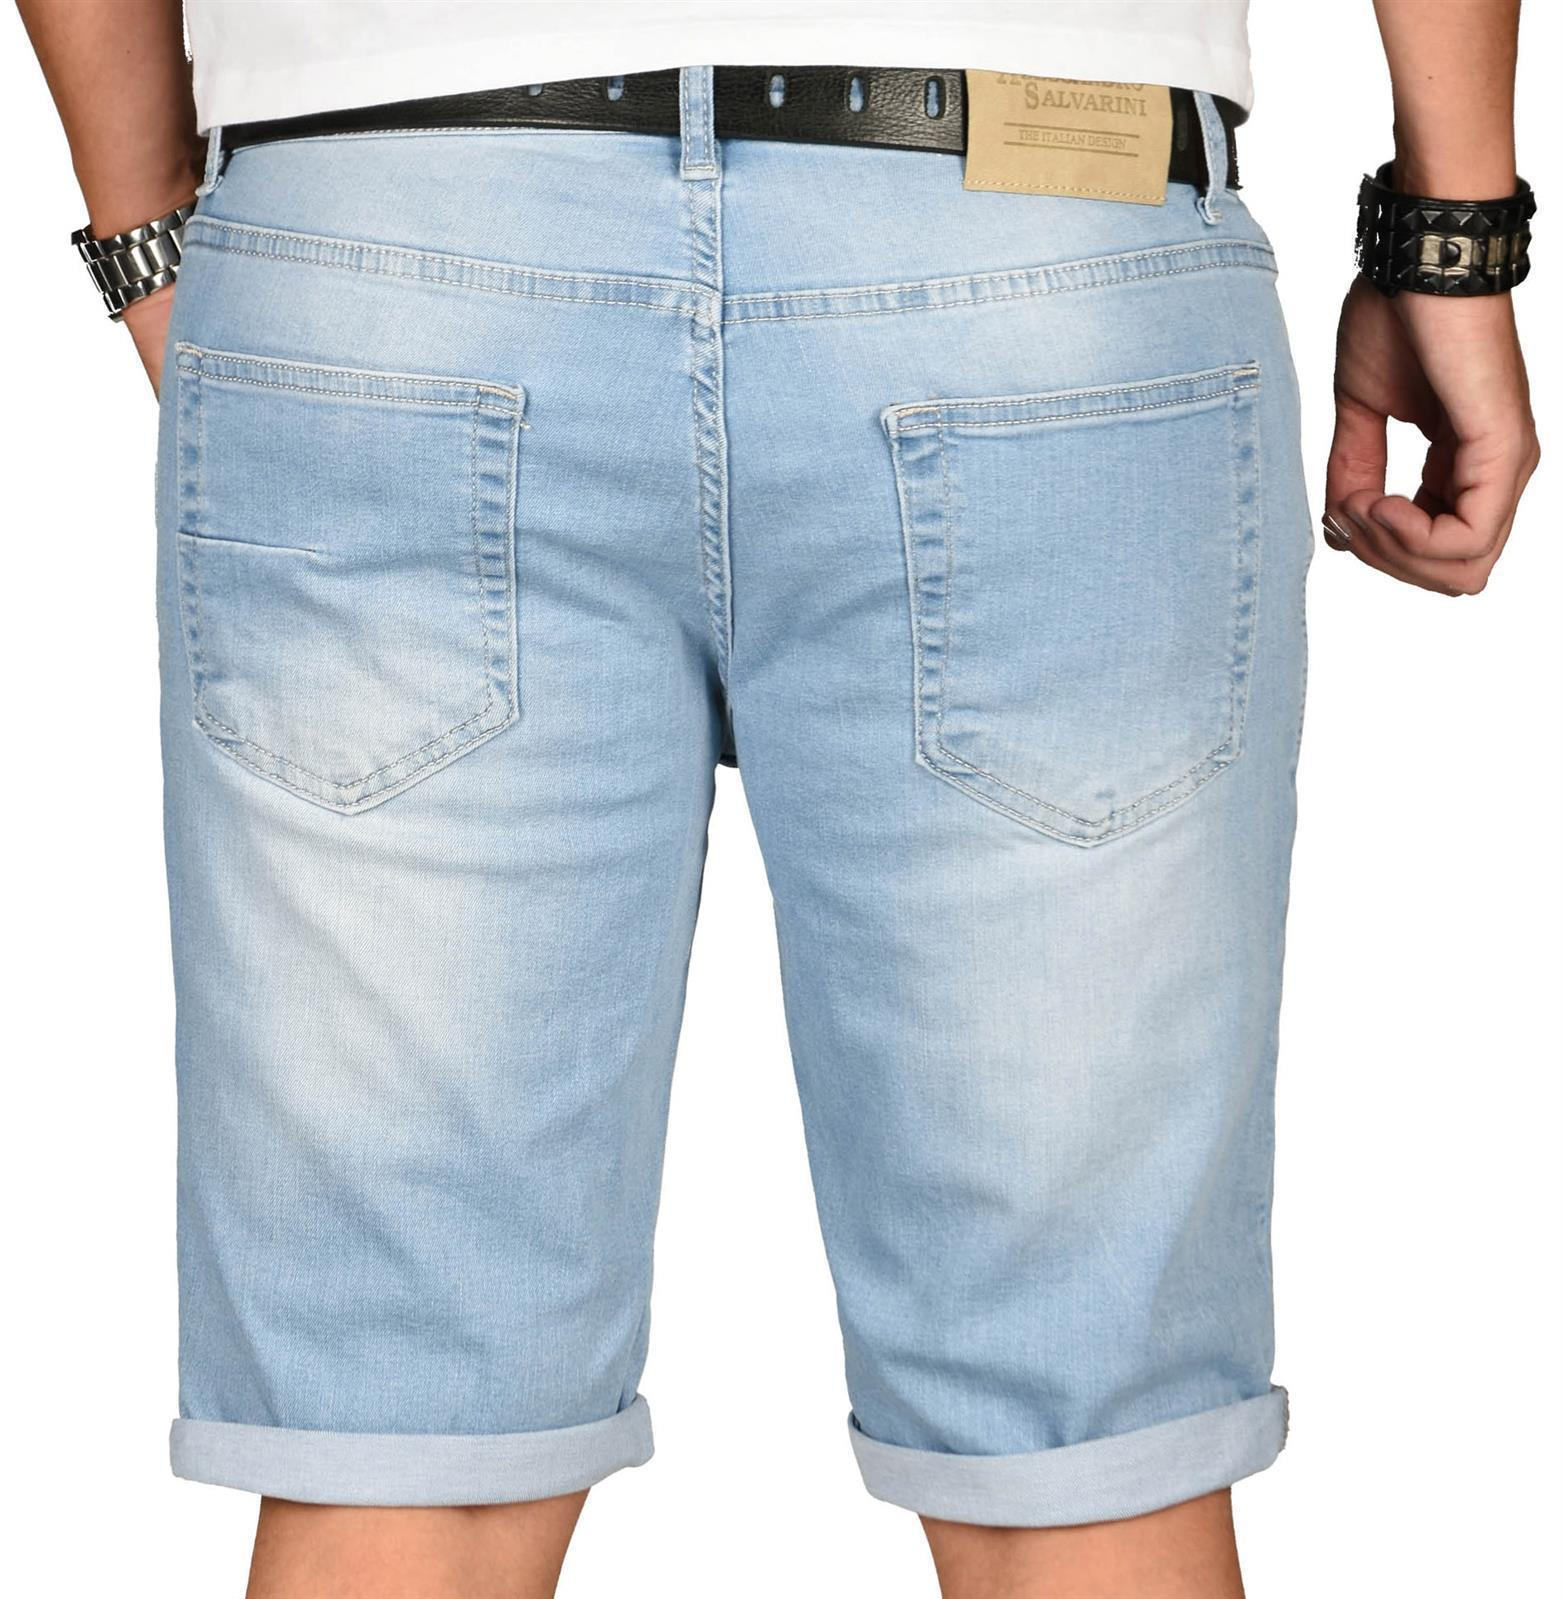 A-Salvarini-Herren-Designer-Jeans-Short-kurze-Hose-Slim-Sommer-Shorts-Washed Indexbild 17